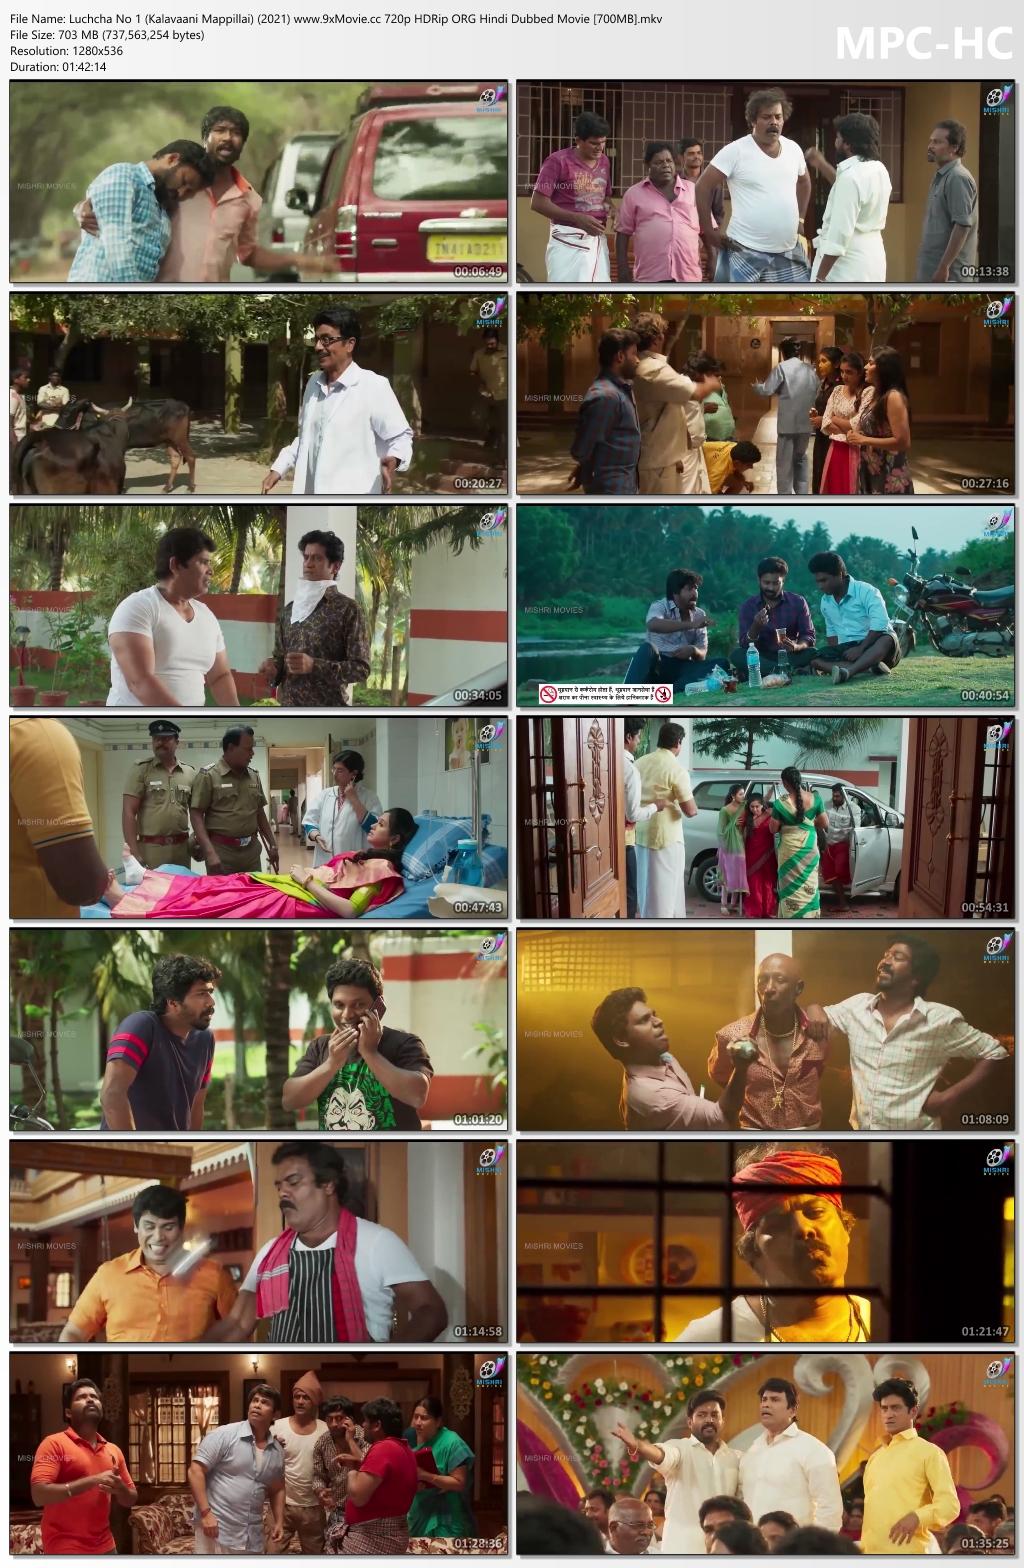 Luchcha-No-1-Kalavaani-Mappillai-2021-www-9x-Movie-cc-720p-HDRip-ORG-Hindi-Dubbed-Movie-700-MB-mkv